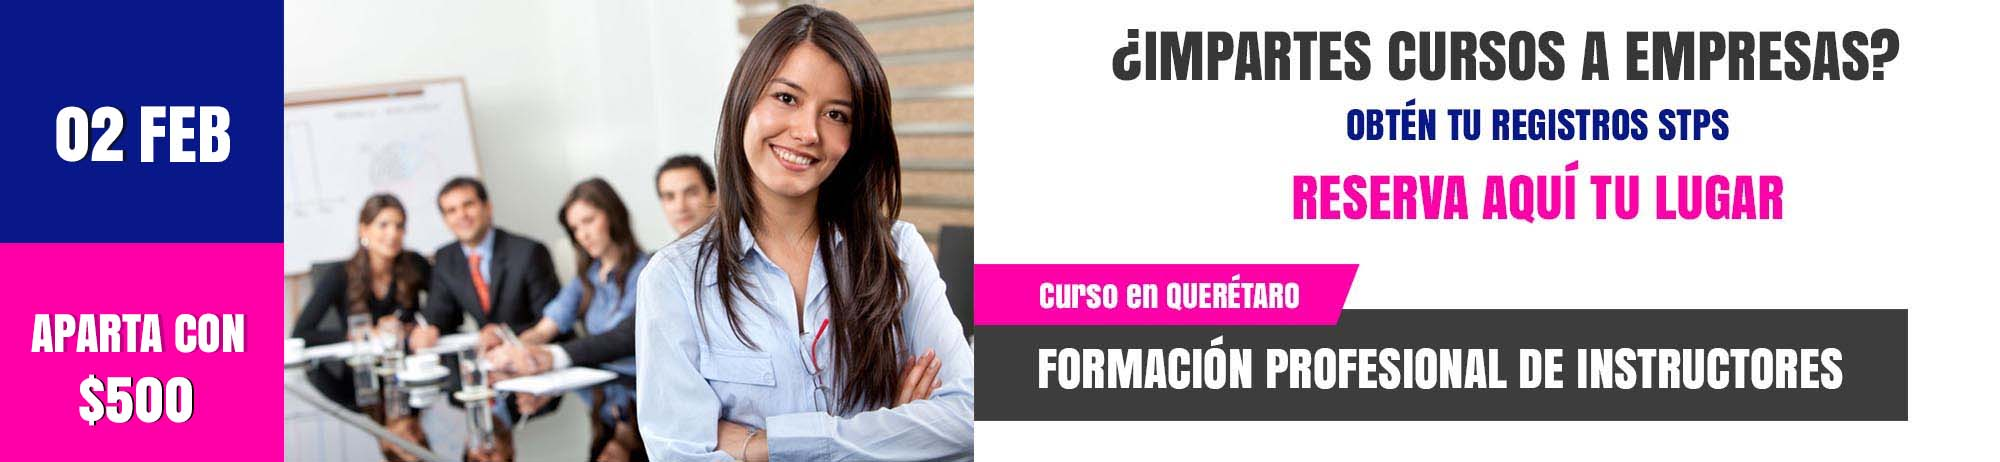 Curso de formación de Instructores en Querétaro